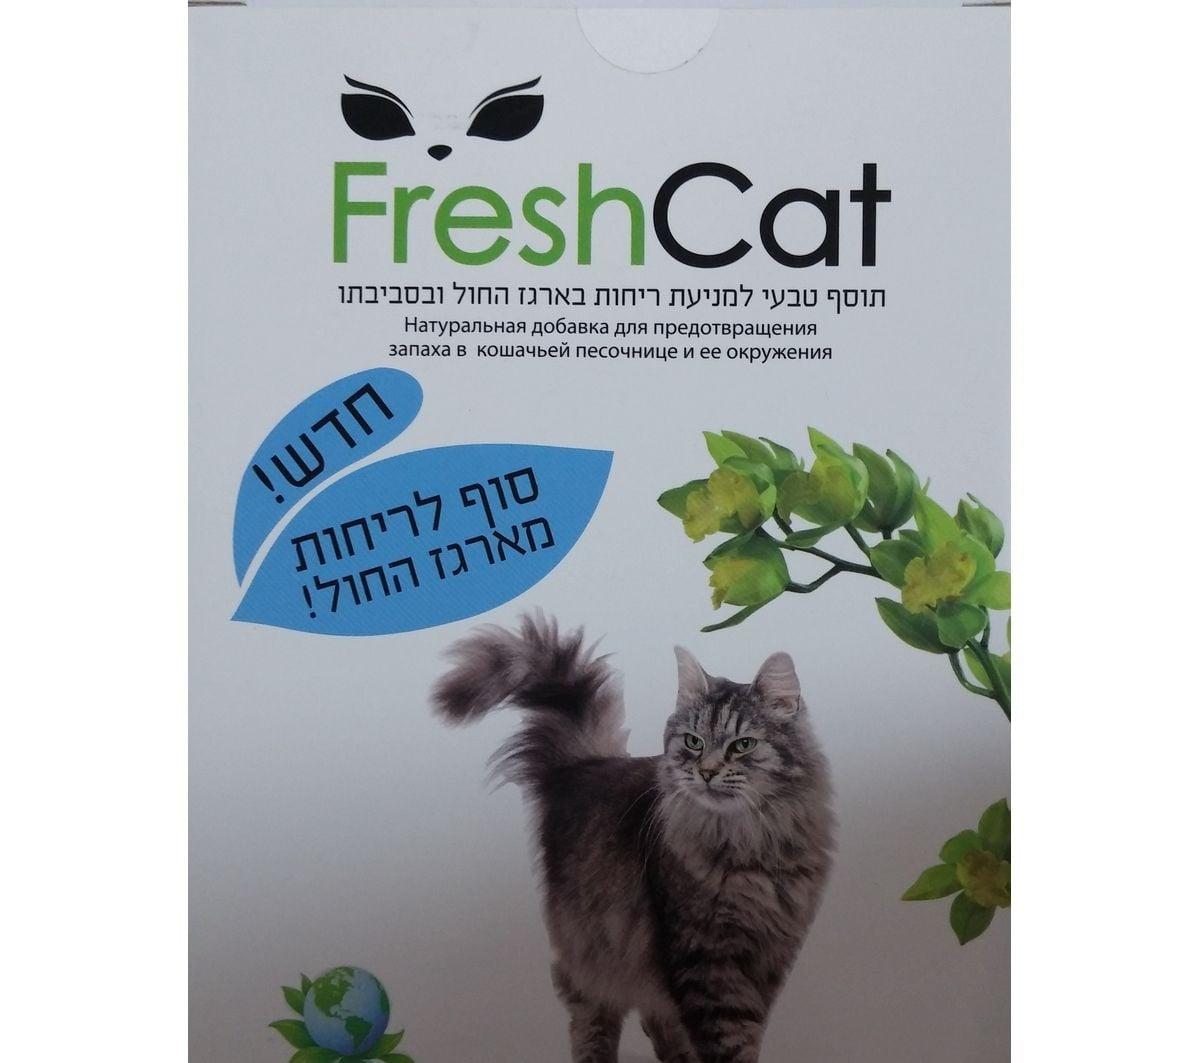 FreshCat תוסף טבעי למניעת ריחות בשירותים של החתול